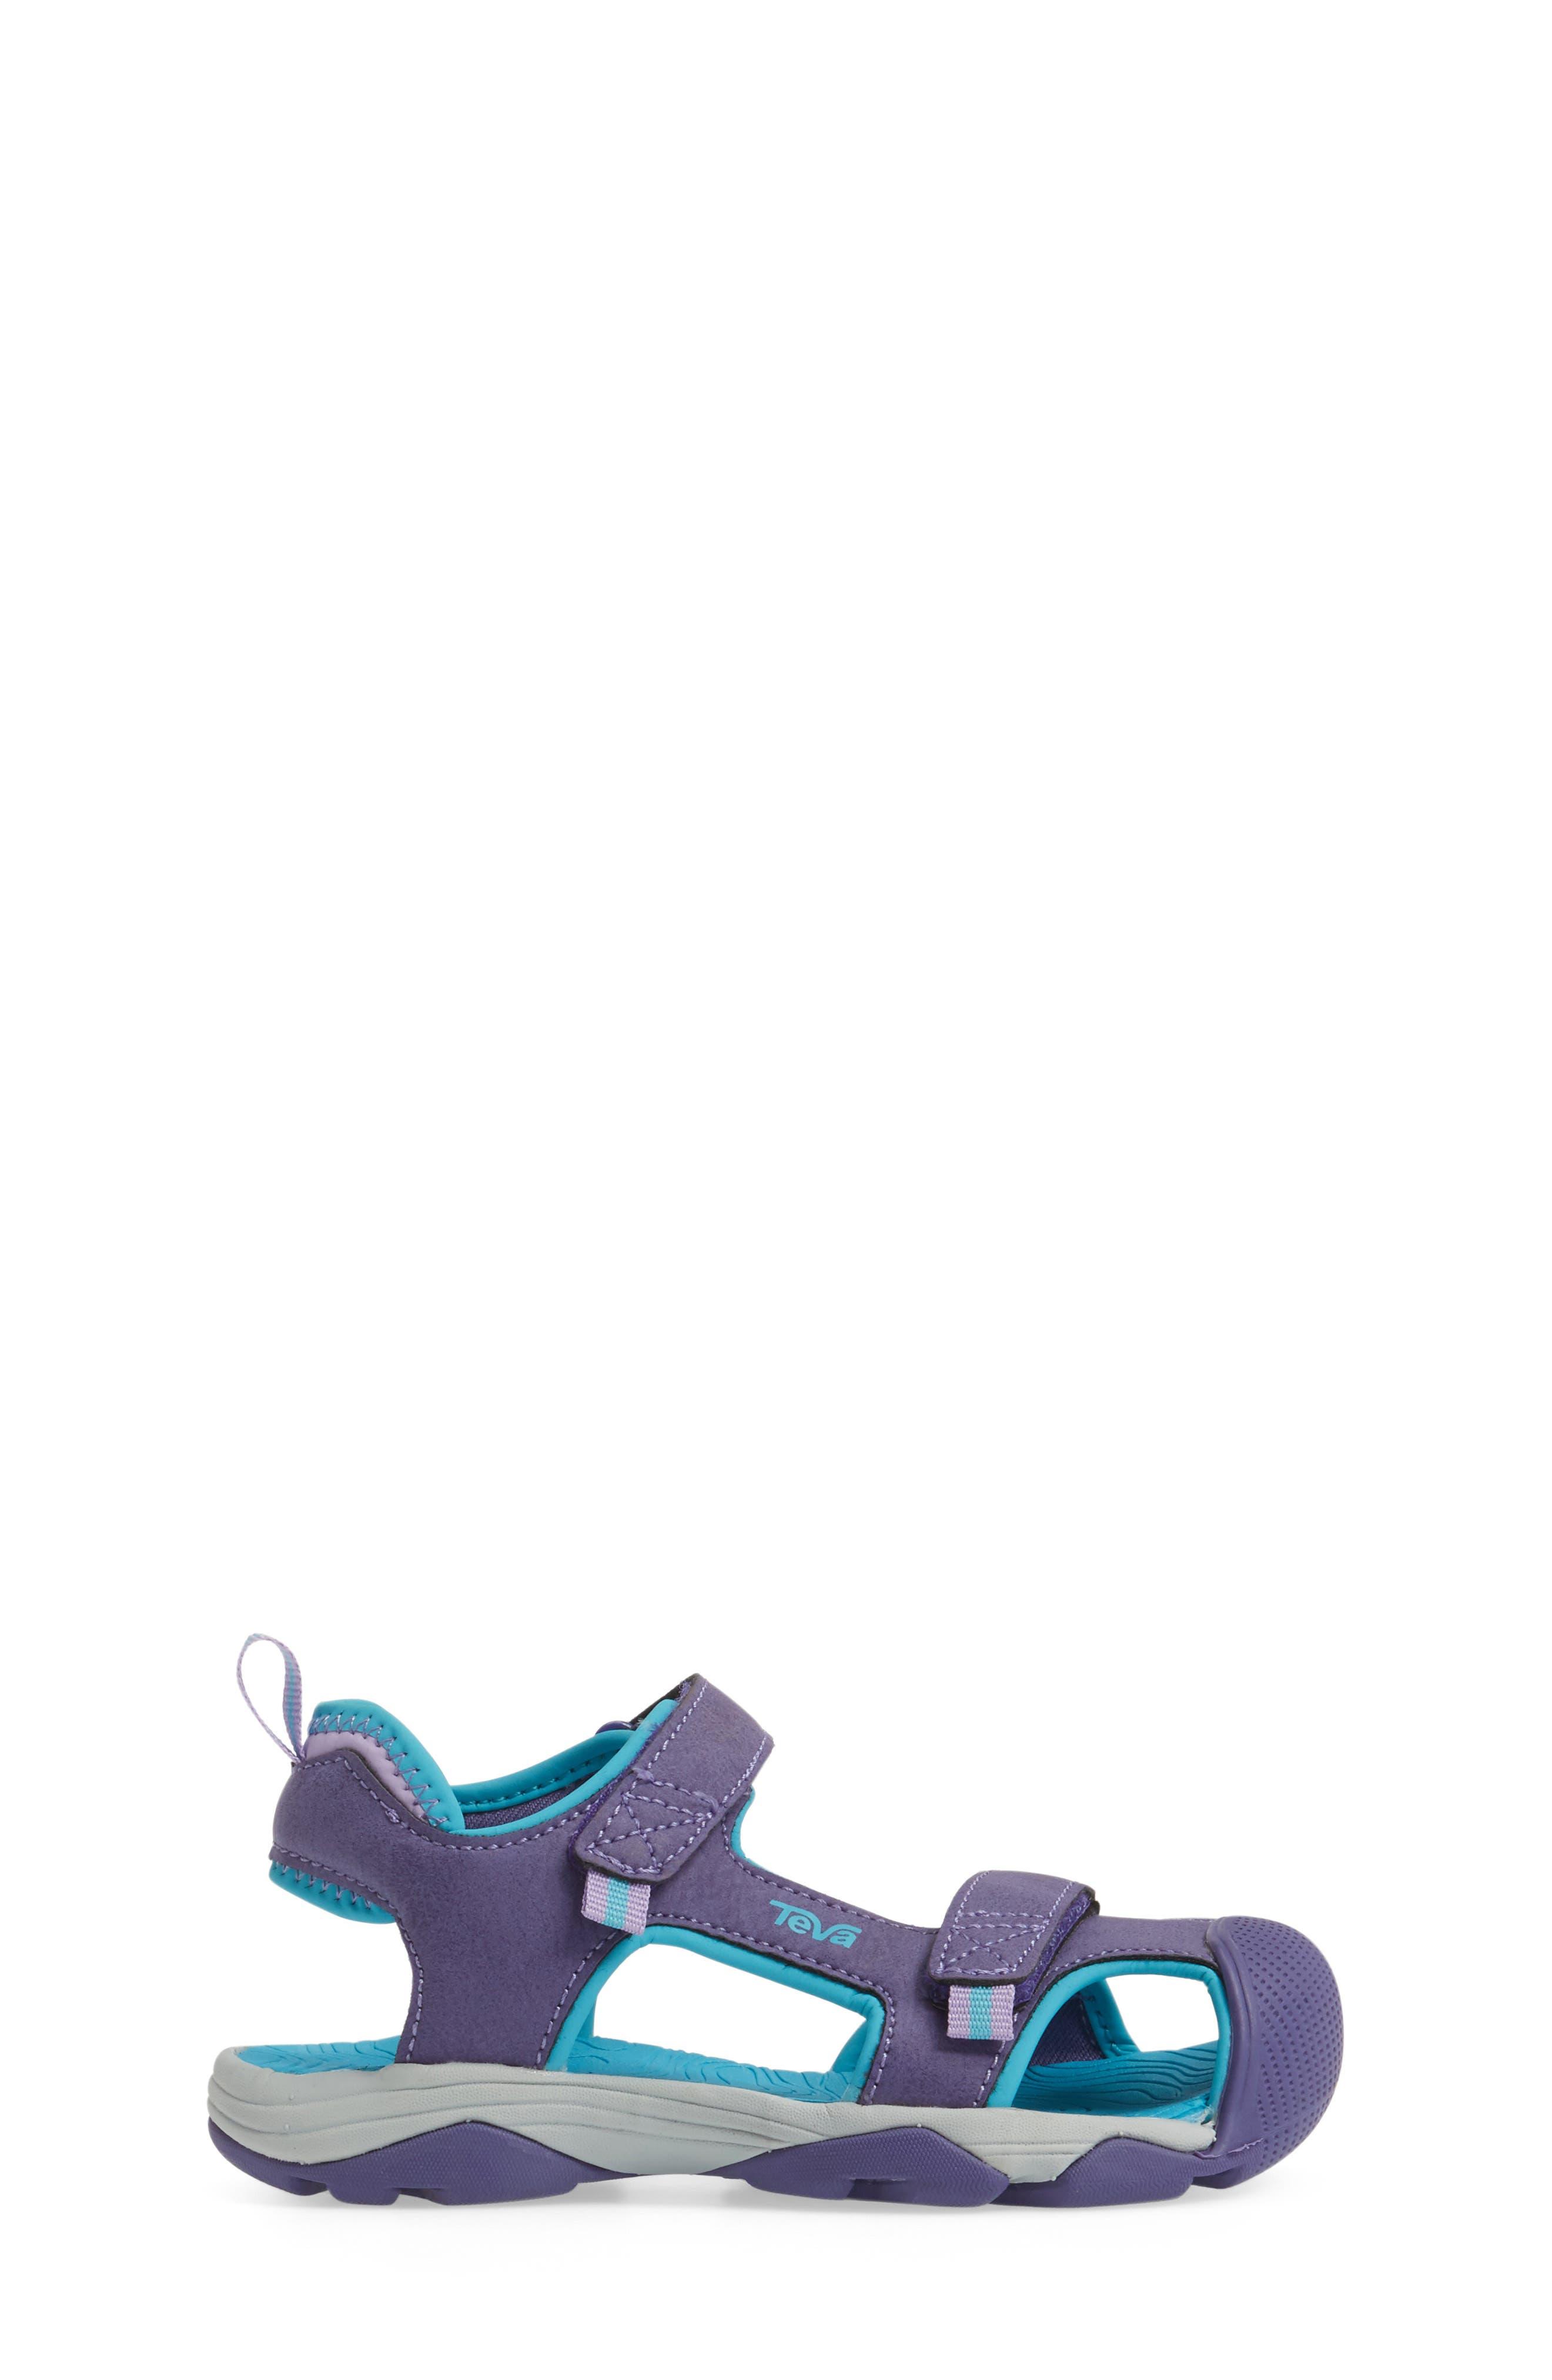 Alternate Image 3  - Teva Toachi 4 Sport Sandal (Toddler, Little Kid & Big Kid)